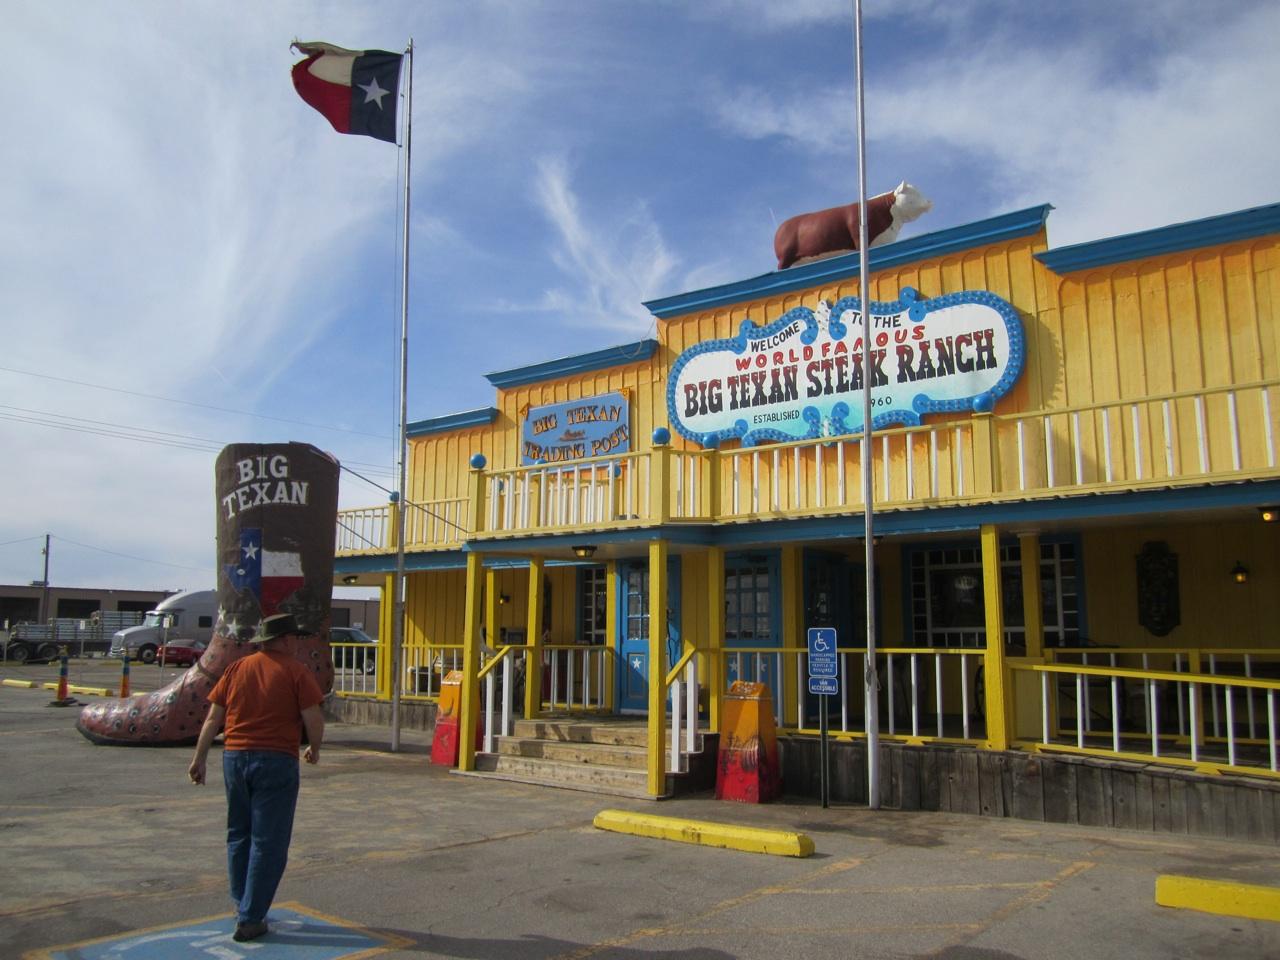 The Big Texan Steak Ranch In Amarillo, TX